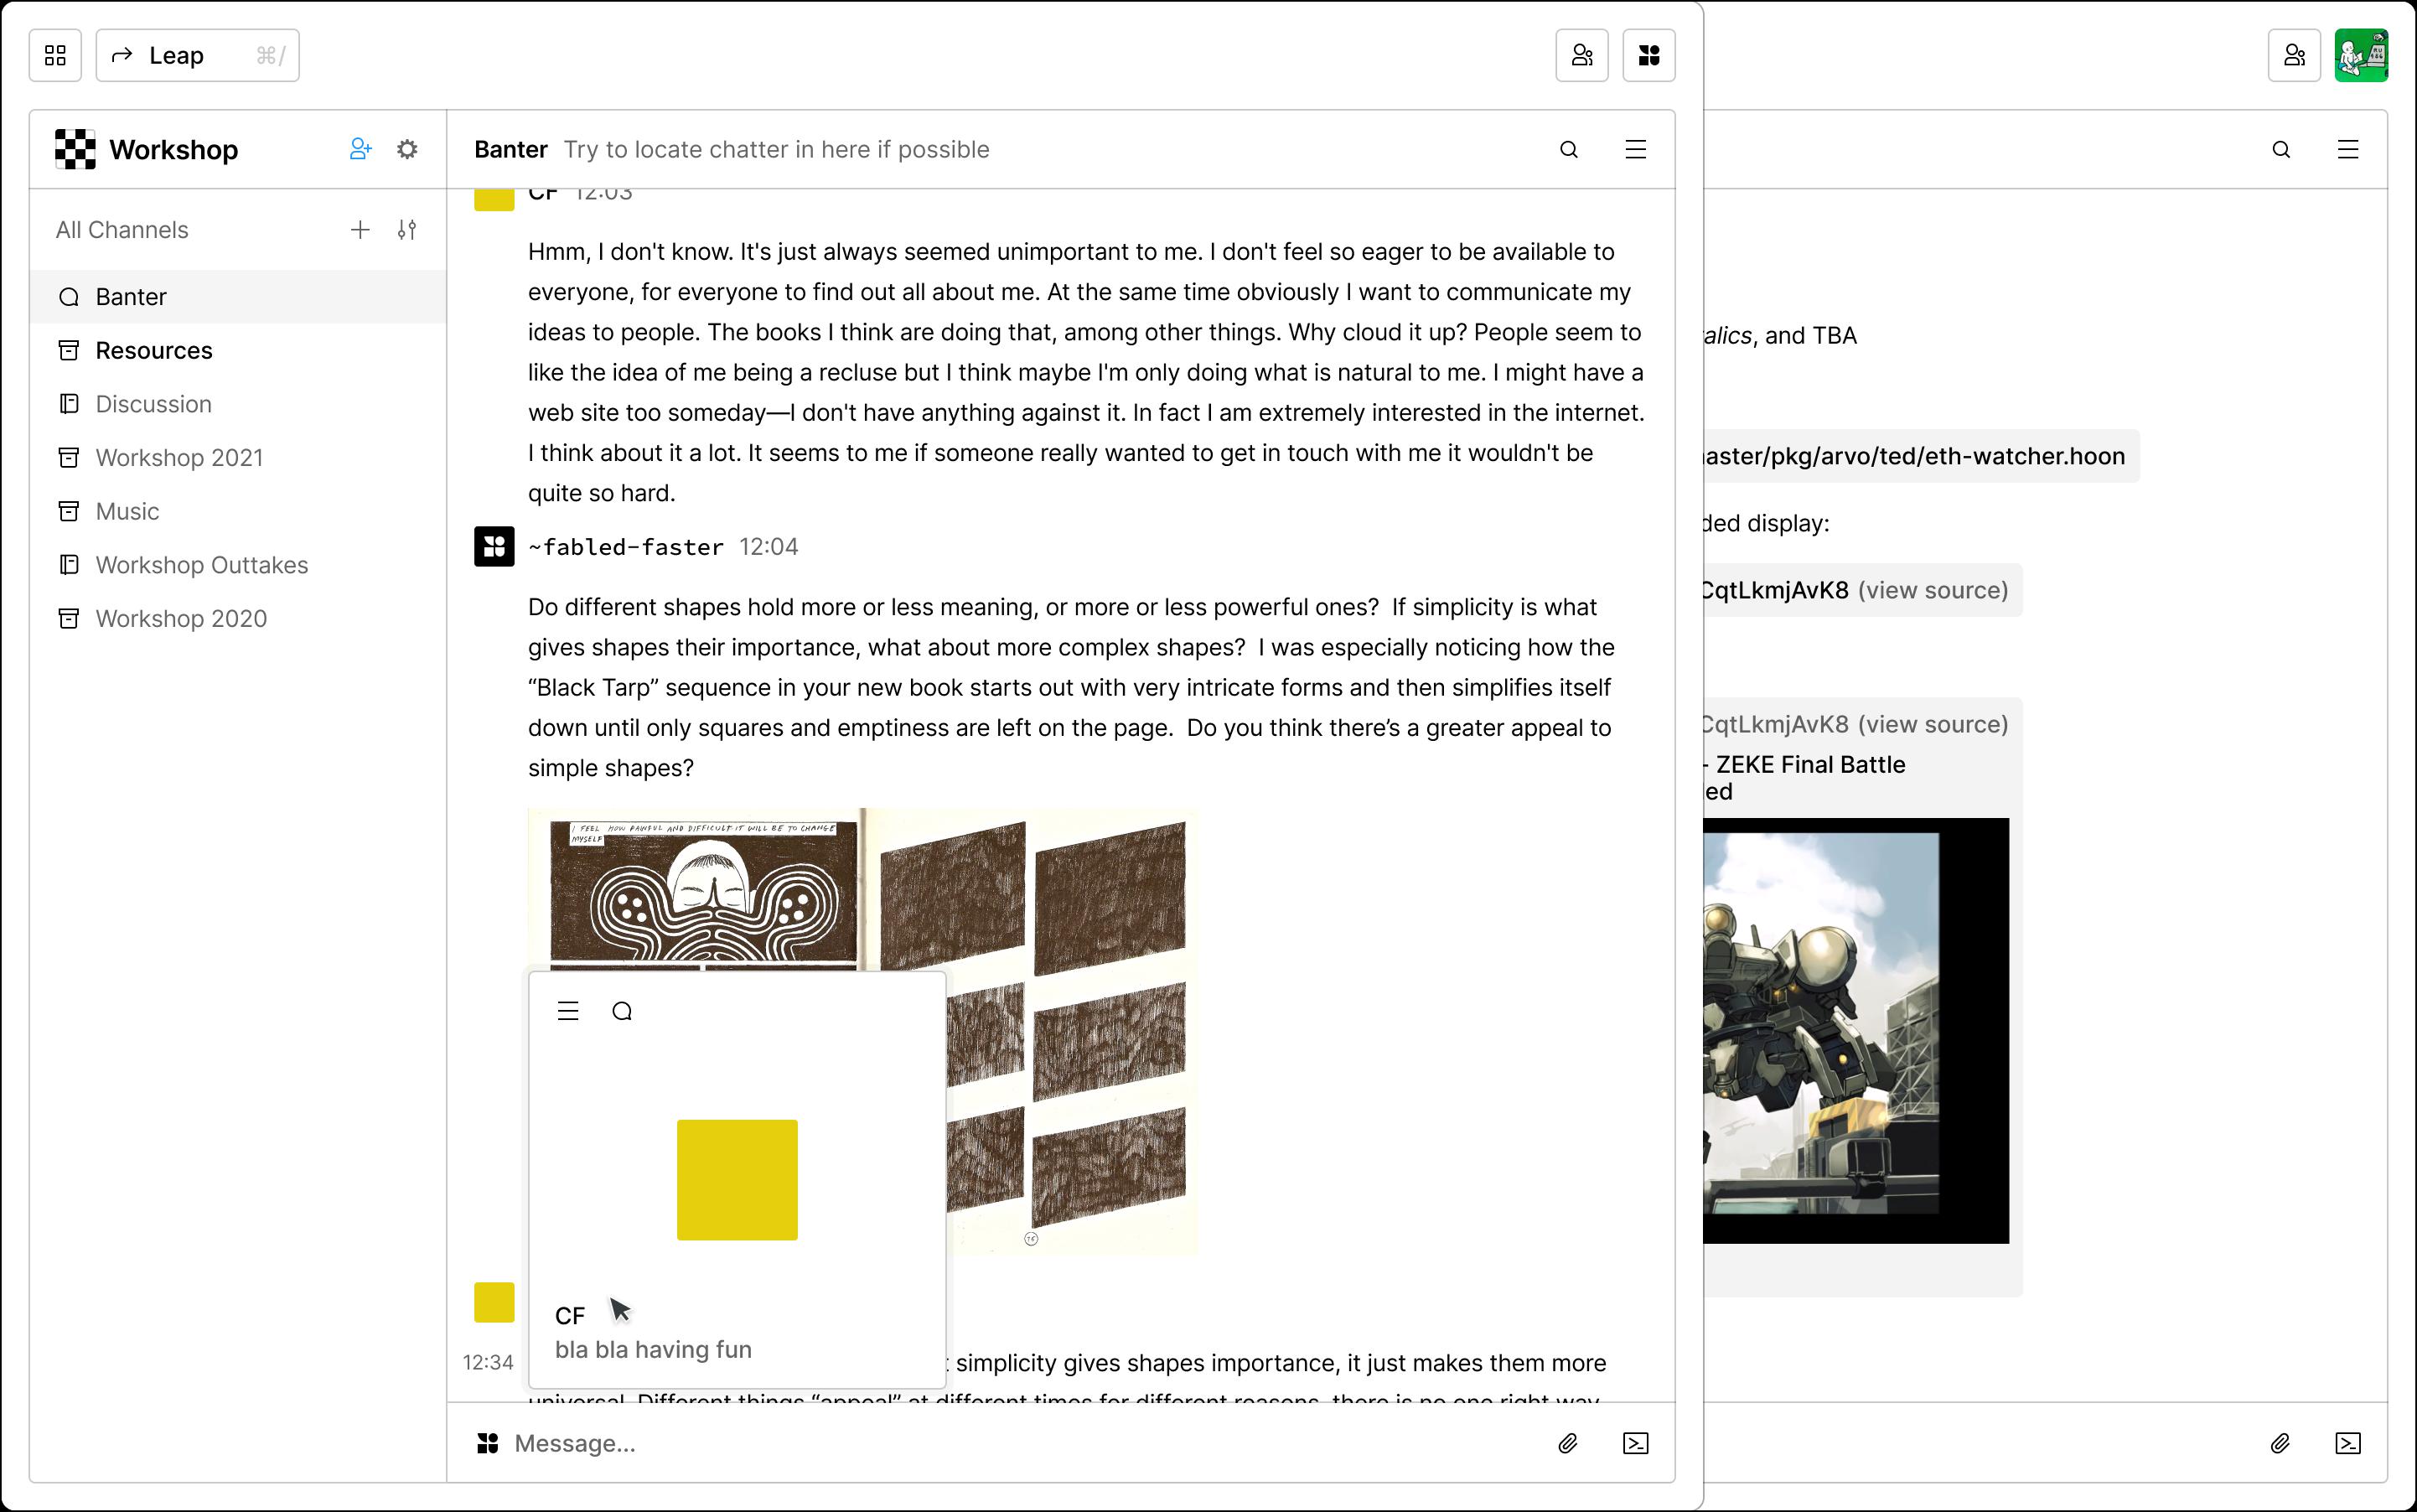 Landscape Chat Interface